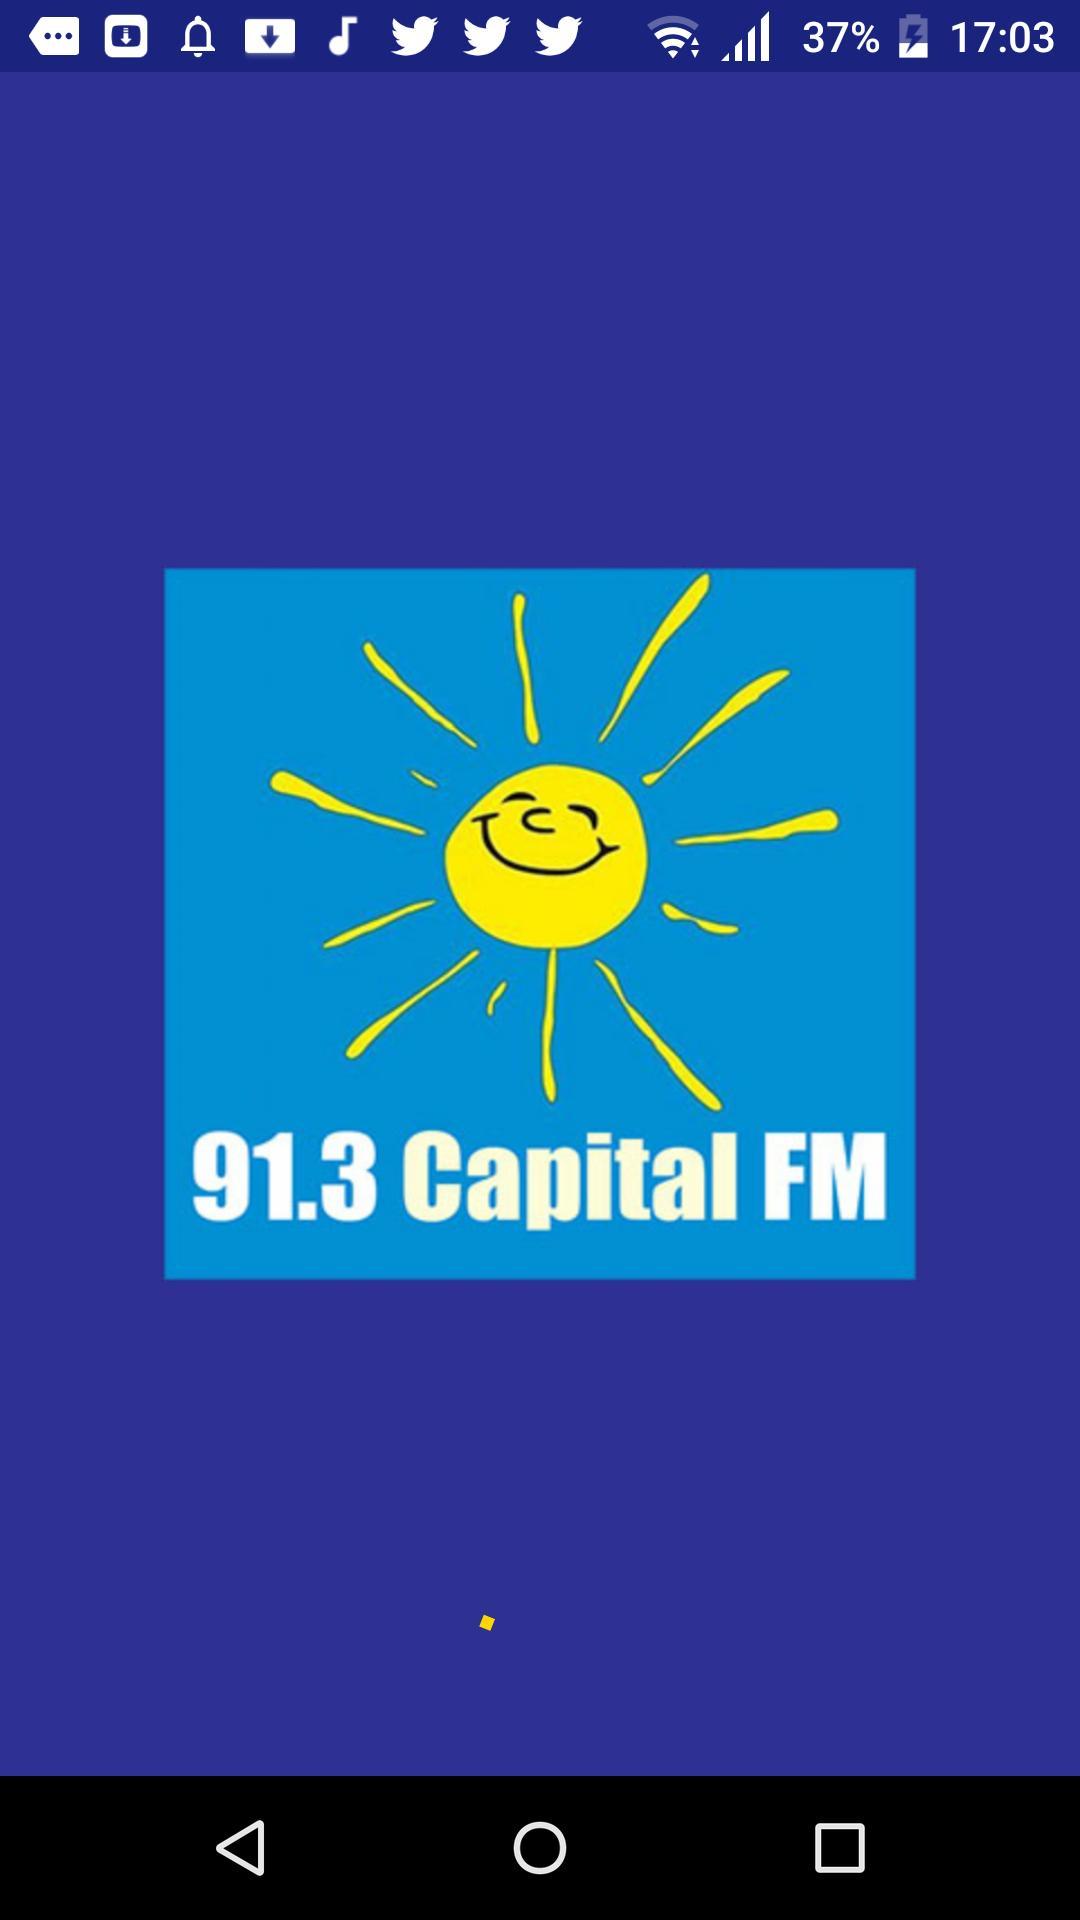 91 3 Capital FM - Kampala - Live Stream for Android - APK